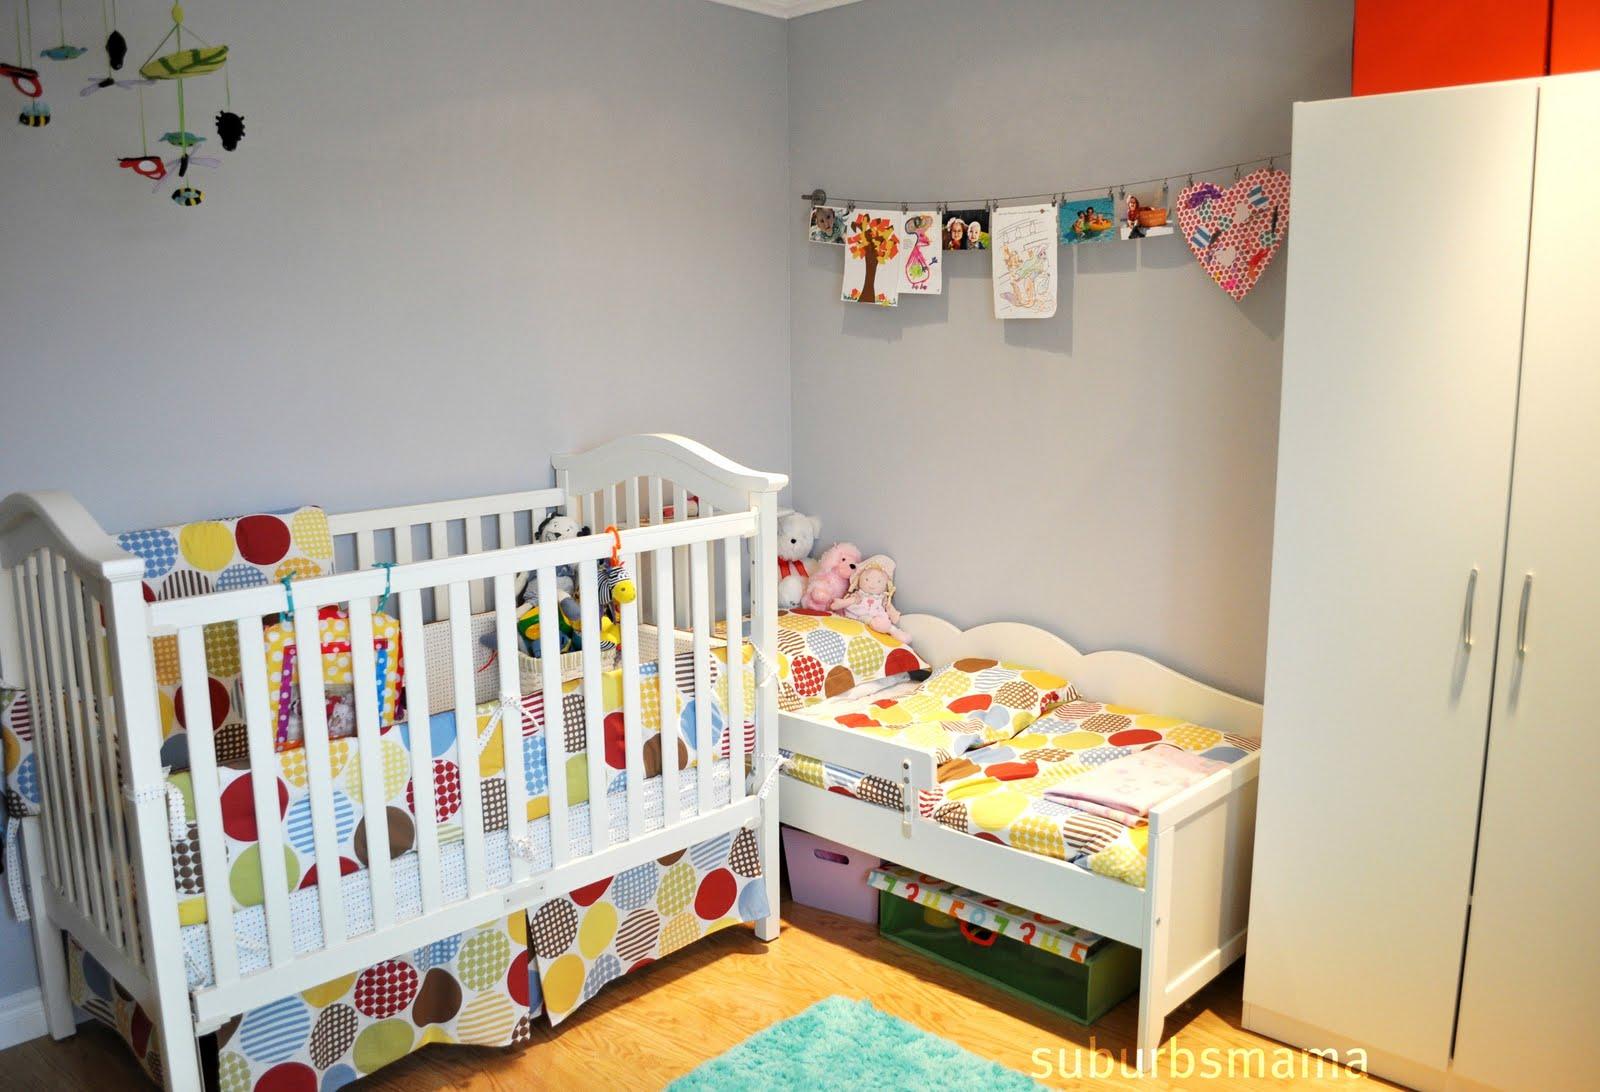 Suburbs Mama Shared Kids Room Tour